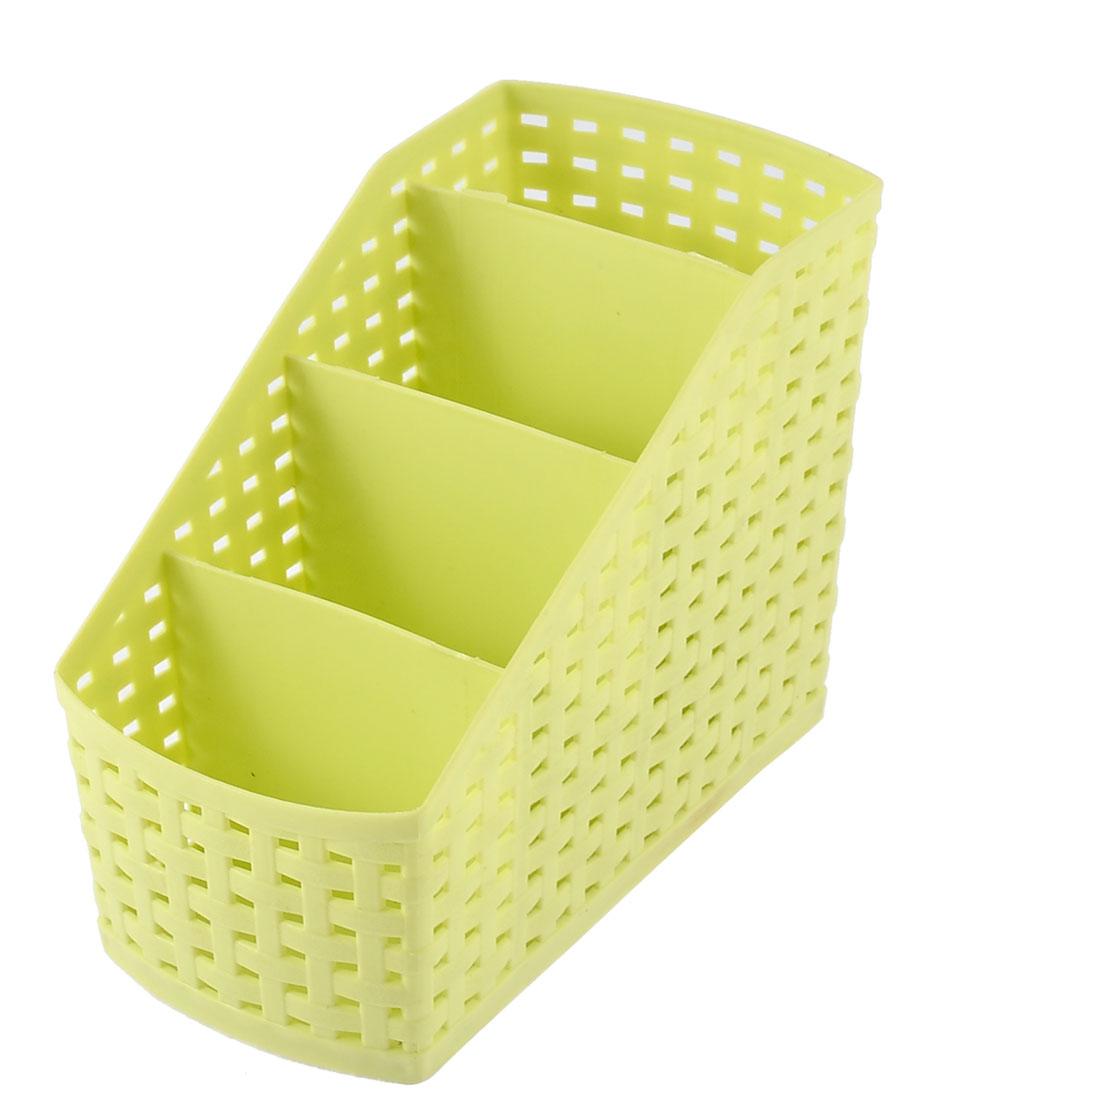 Bathroom Makeup Desktop Plastic 4 Grids Storage Organizer Divider Box Green